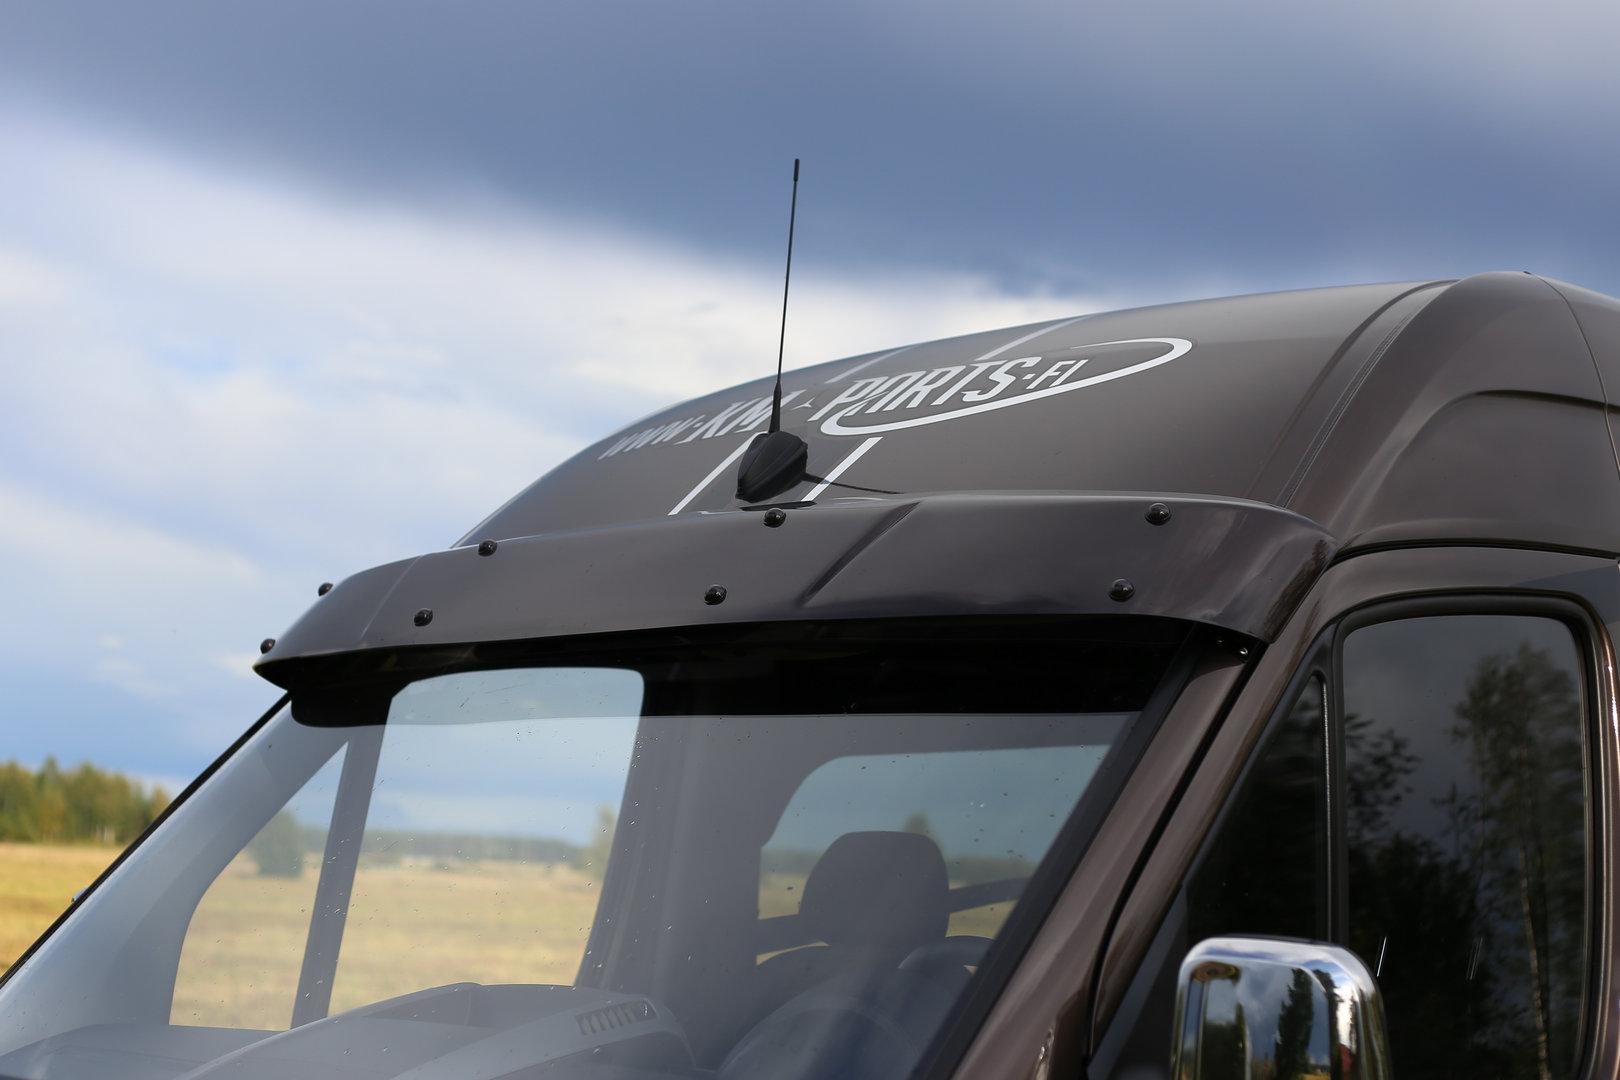 Fiat Ducato Sun Visor Shiny Black Tuning Parts For Ducato